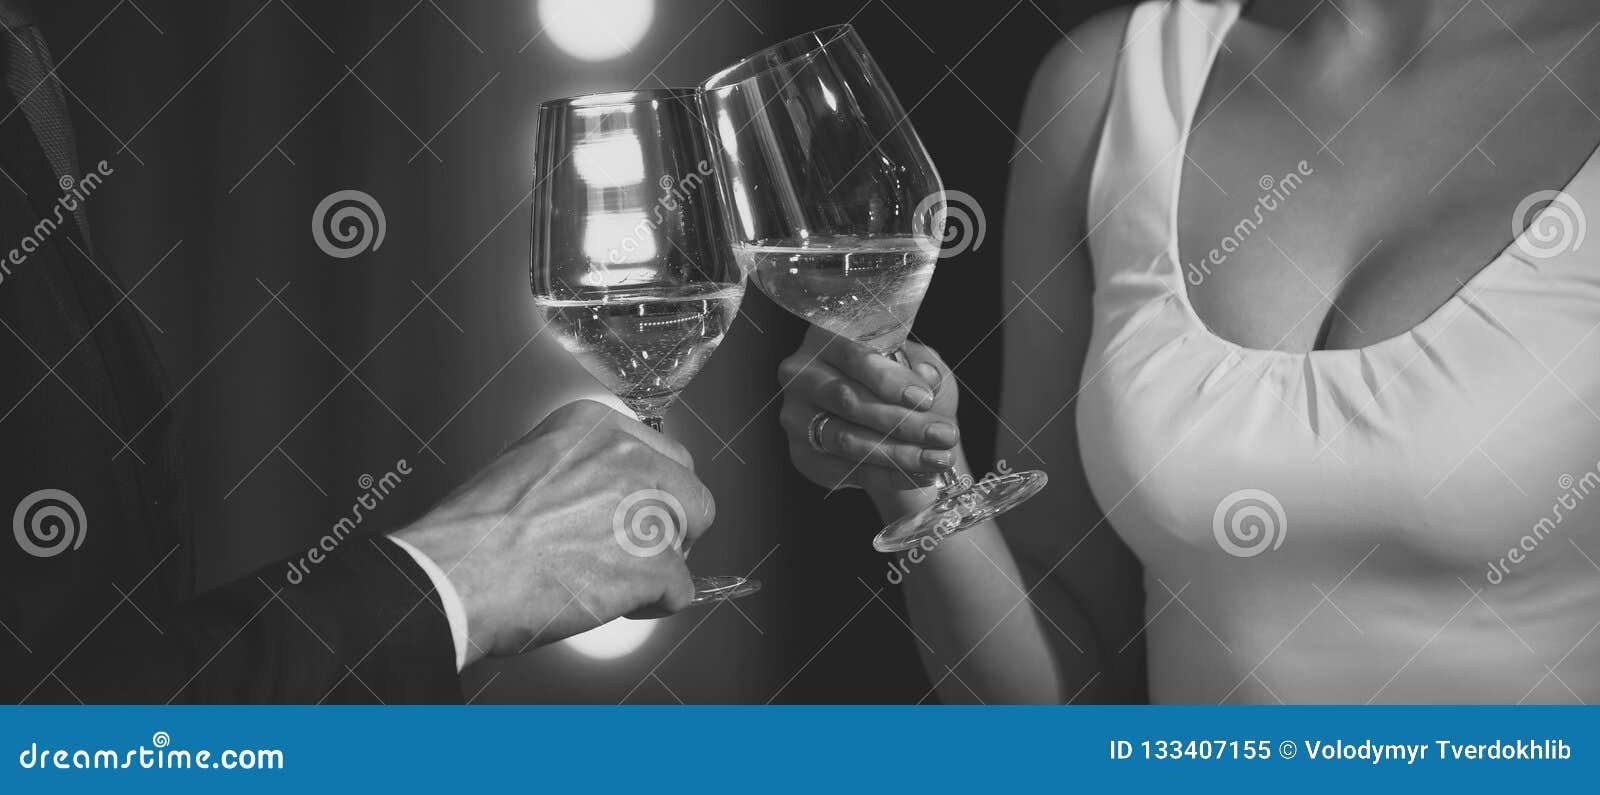 Здравица пар clink стекла с белым вином